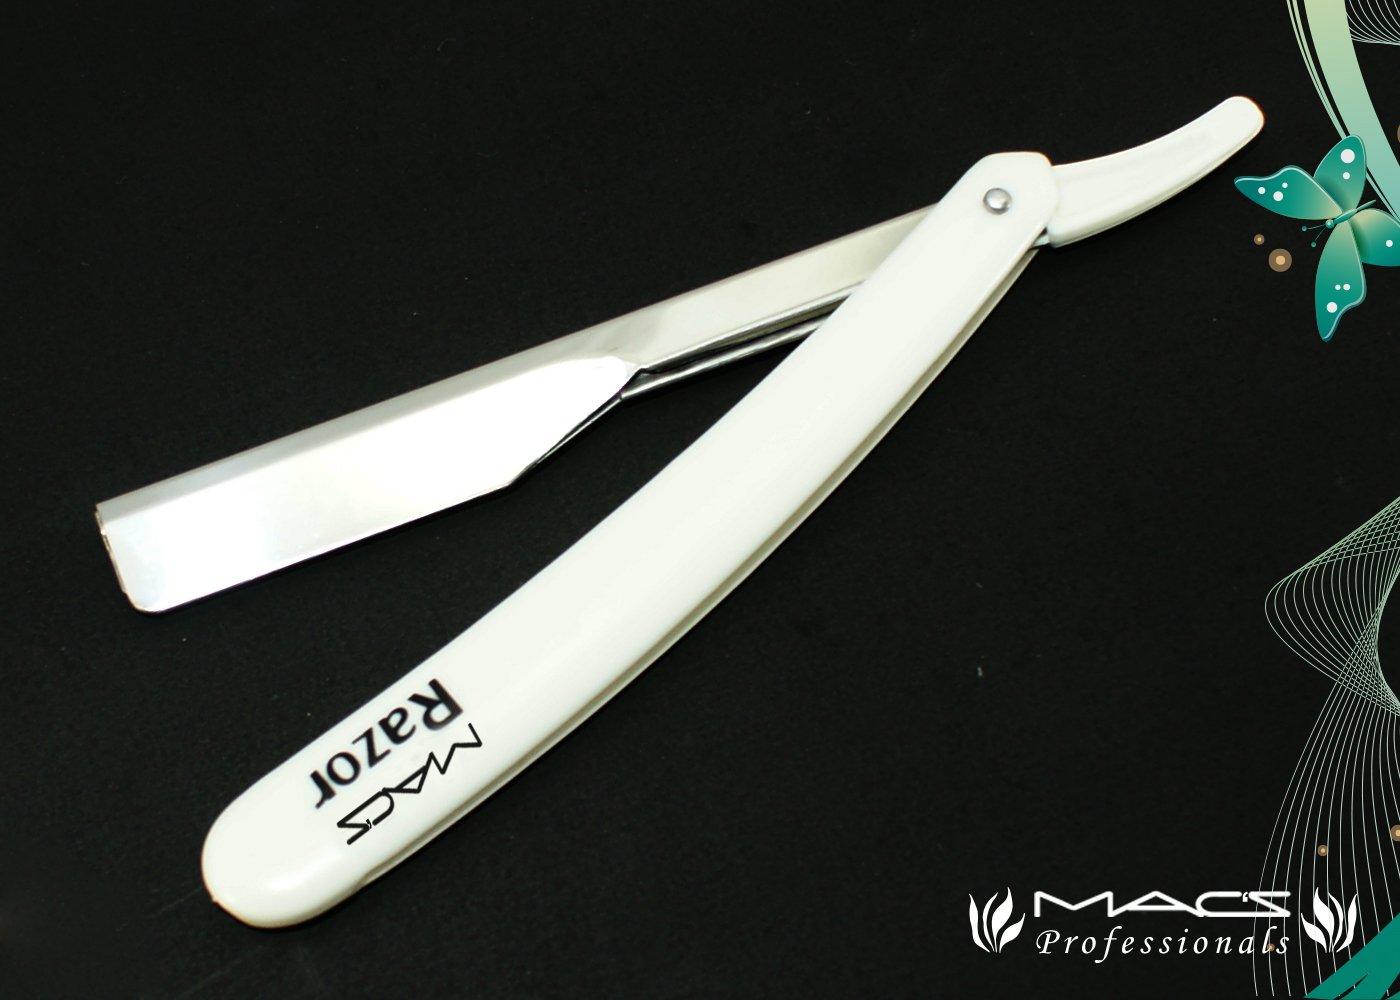 Professional Barber Straight Edge Half Blade Exchangeable Balde Barber Shaving Razors Macs Brand-50-01 (Black)